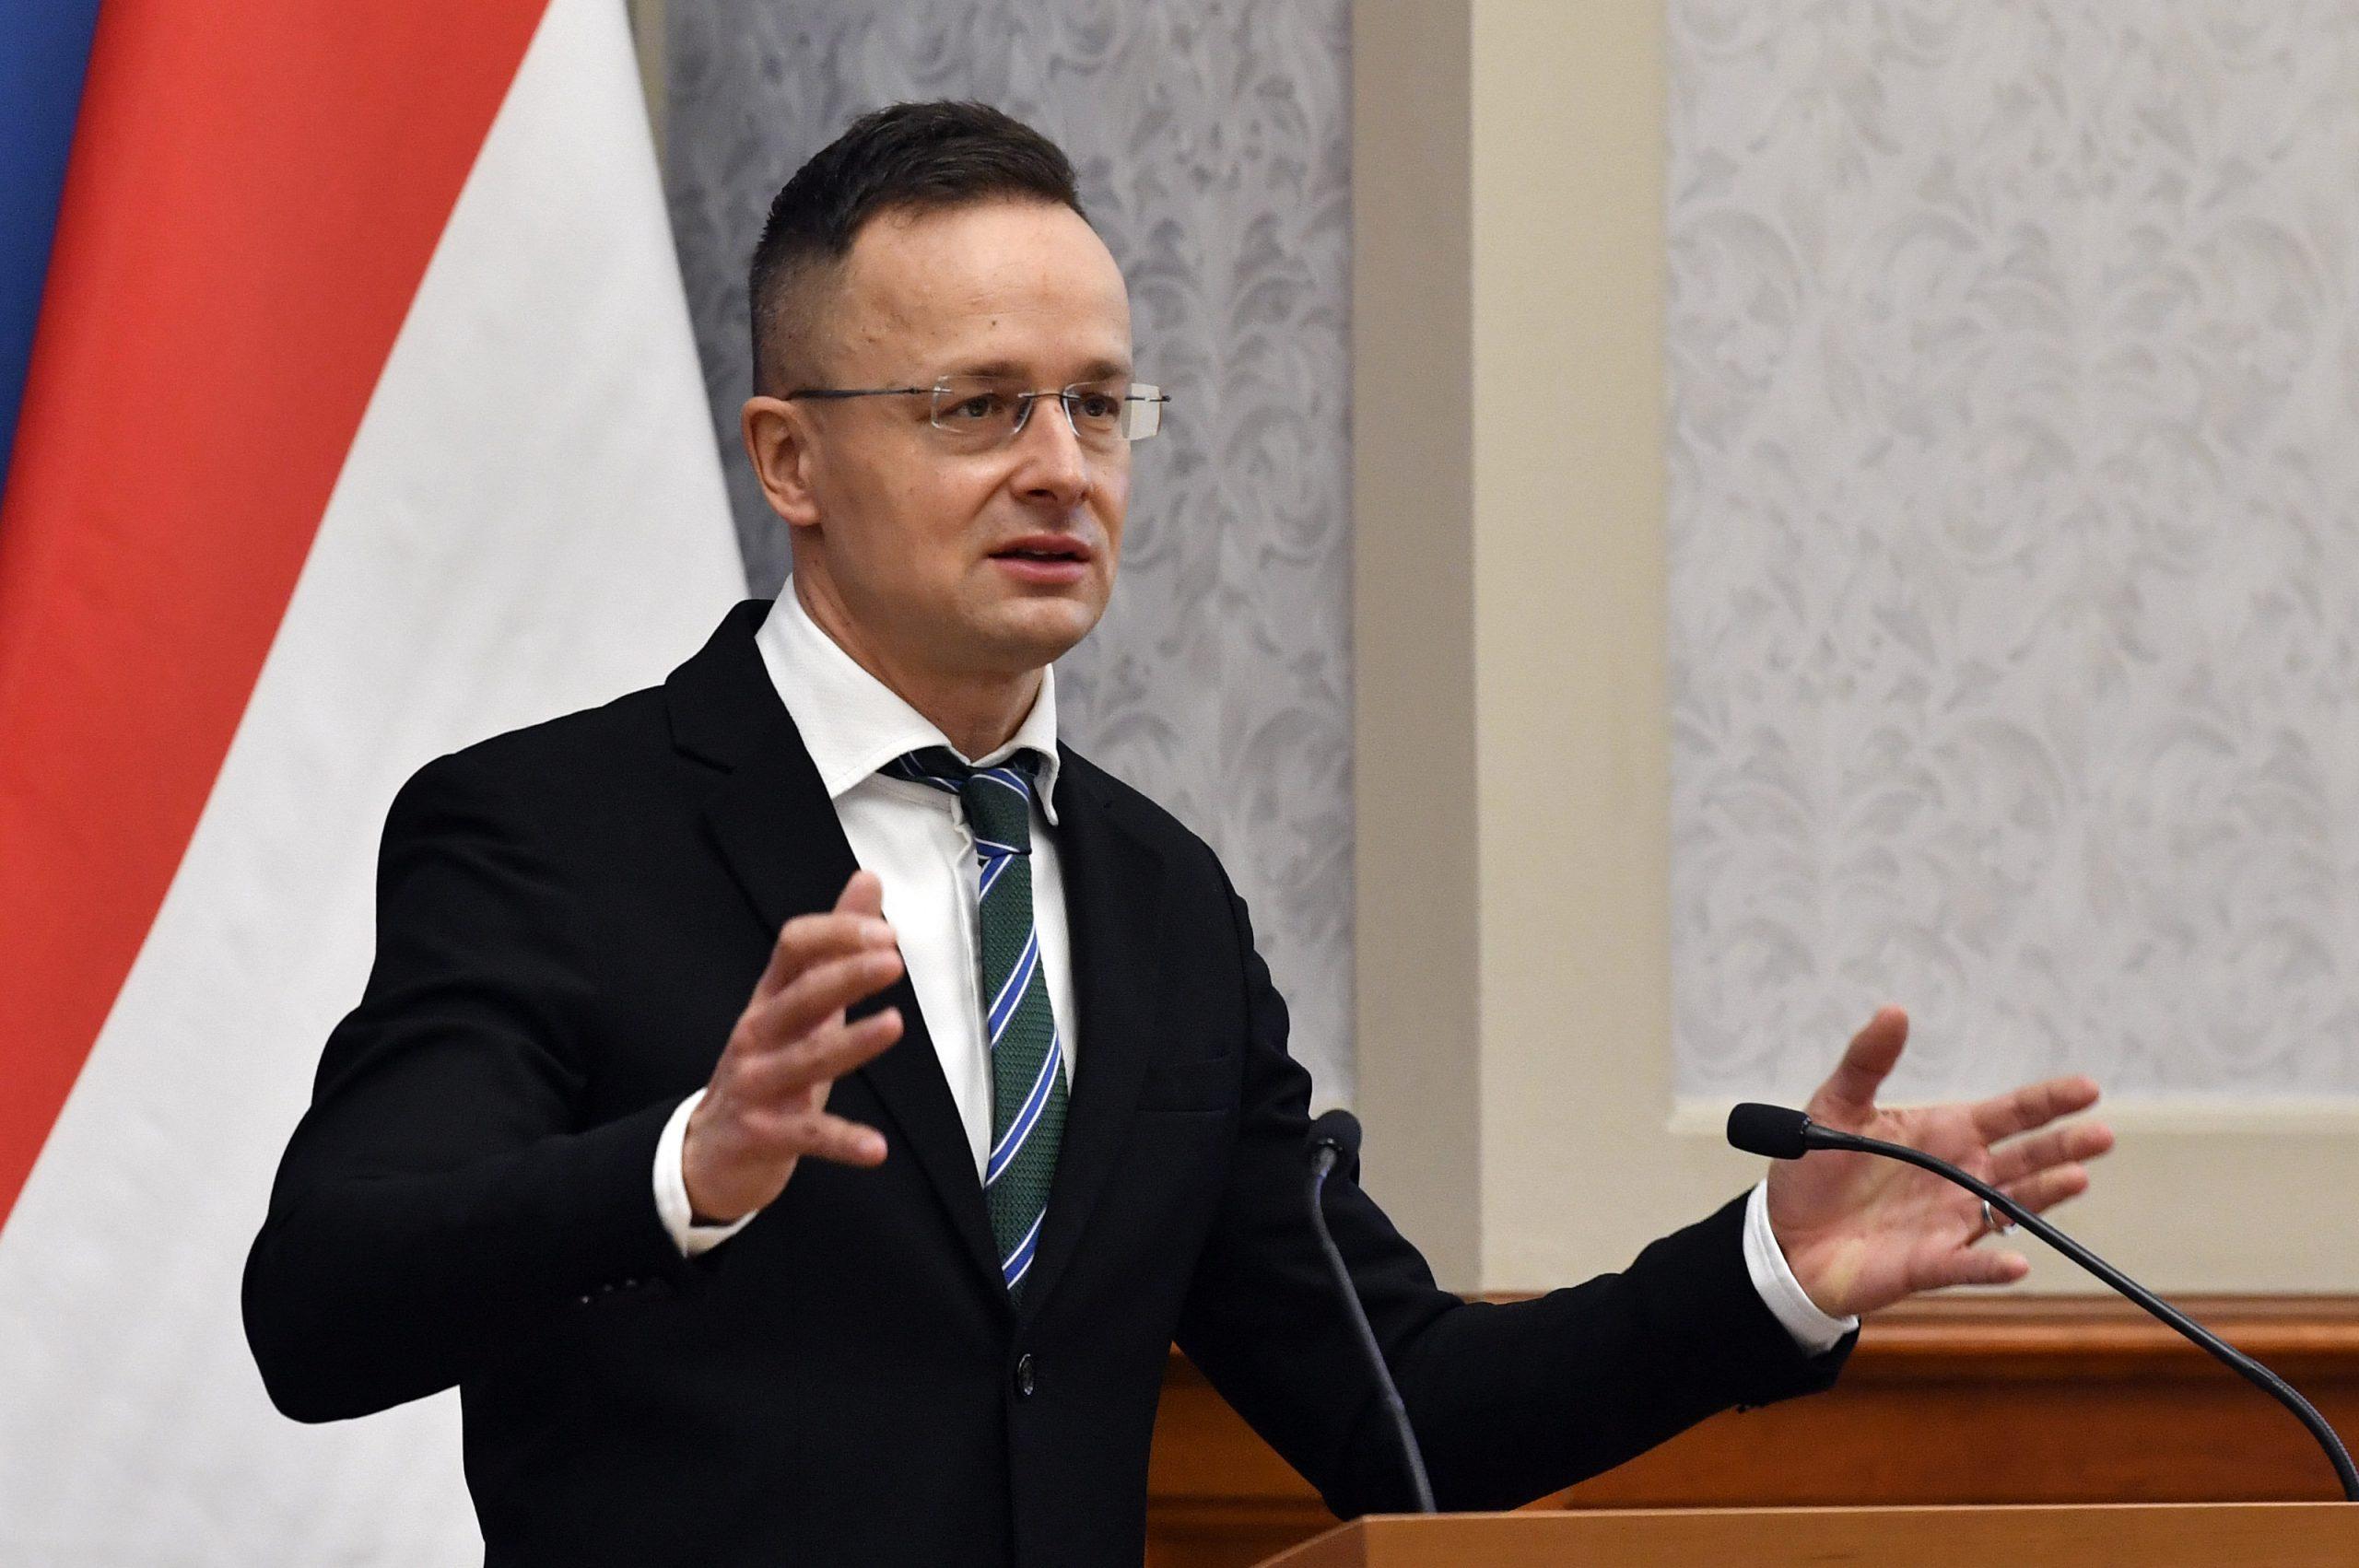 FM Szijjártó: EU Could Lose Western Balkans